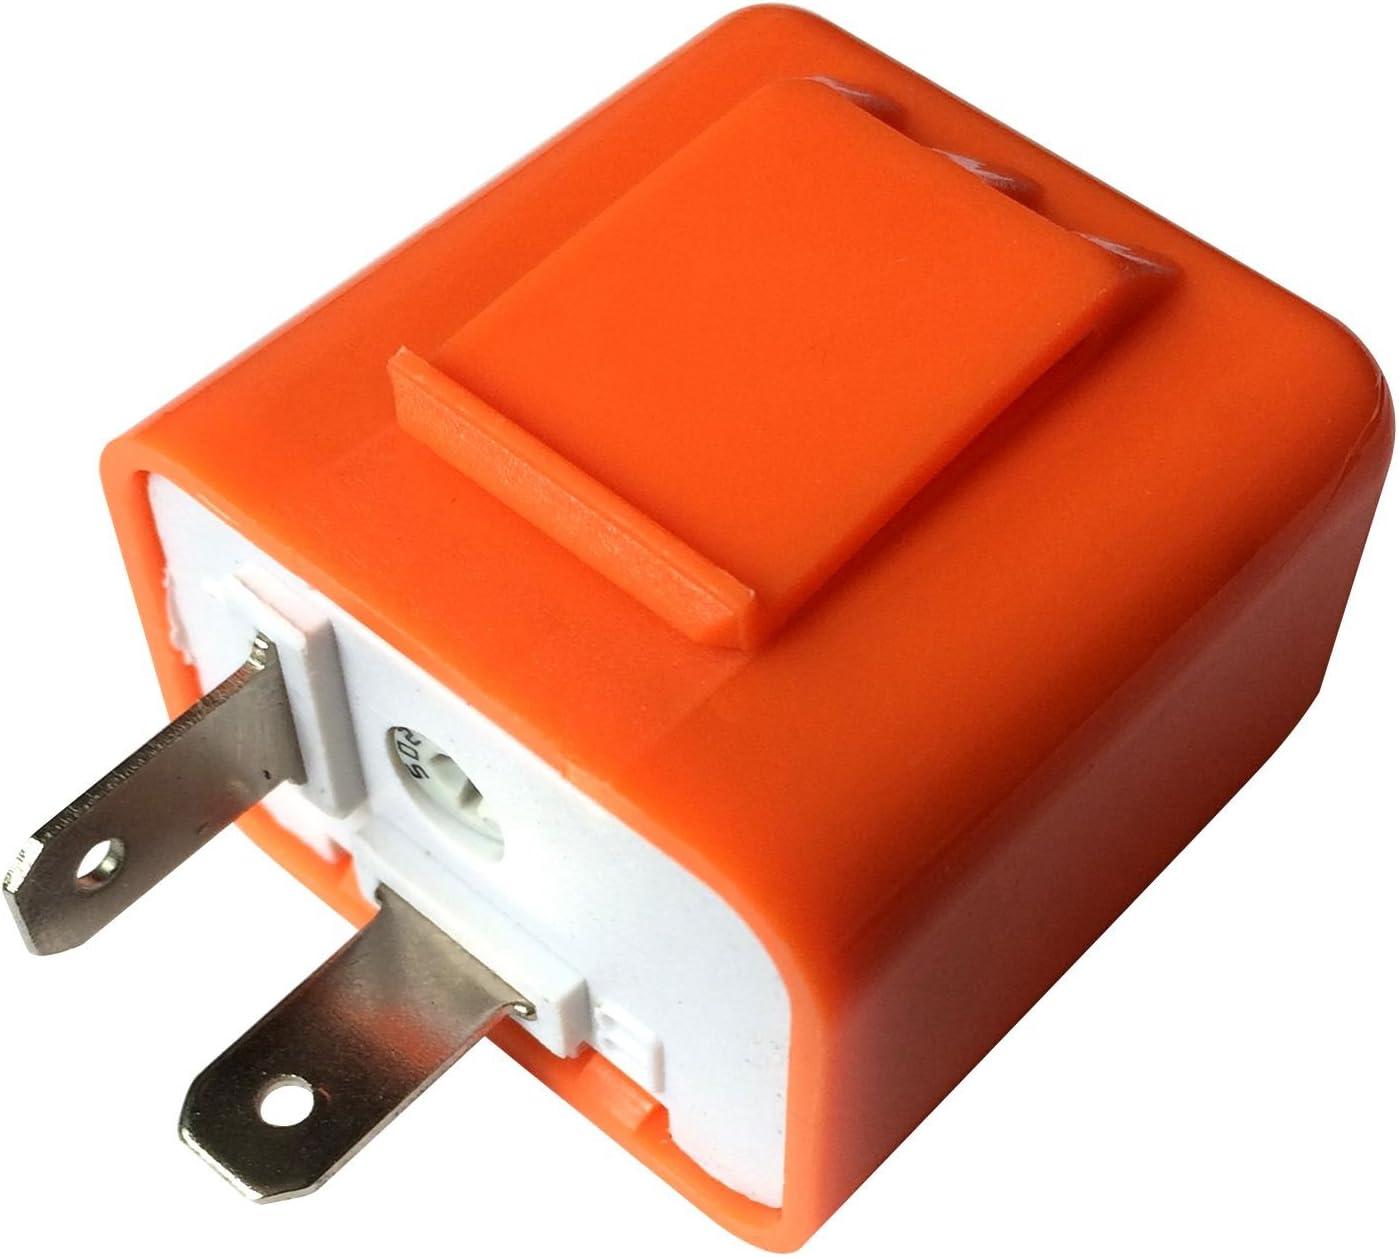 REFURBISHHOUSE 2 Broches Vitesse reglable LED Indicateur Resistance Relais Clignotant Reparer Flash Moto